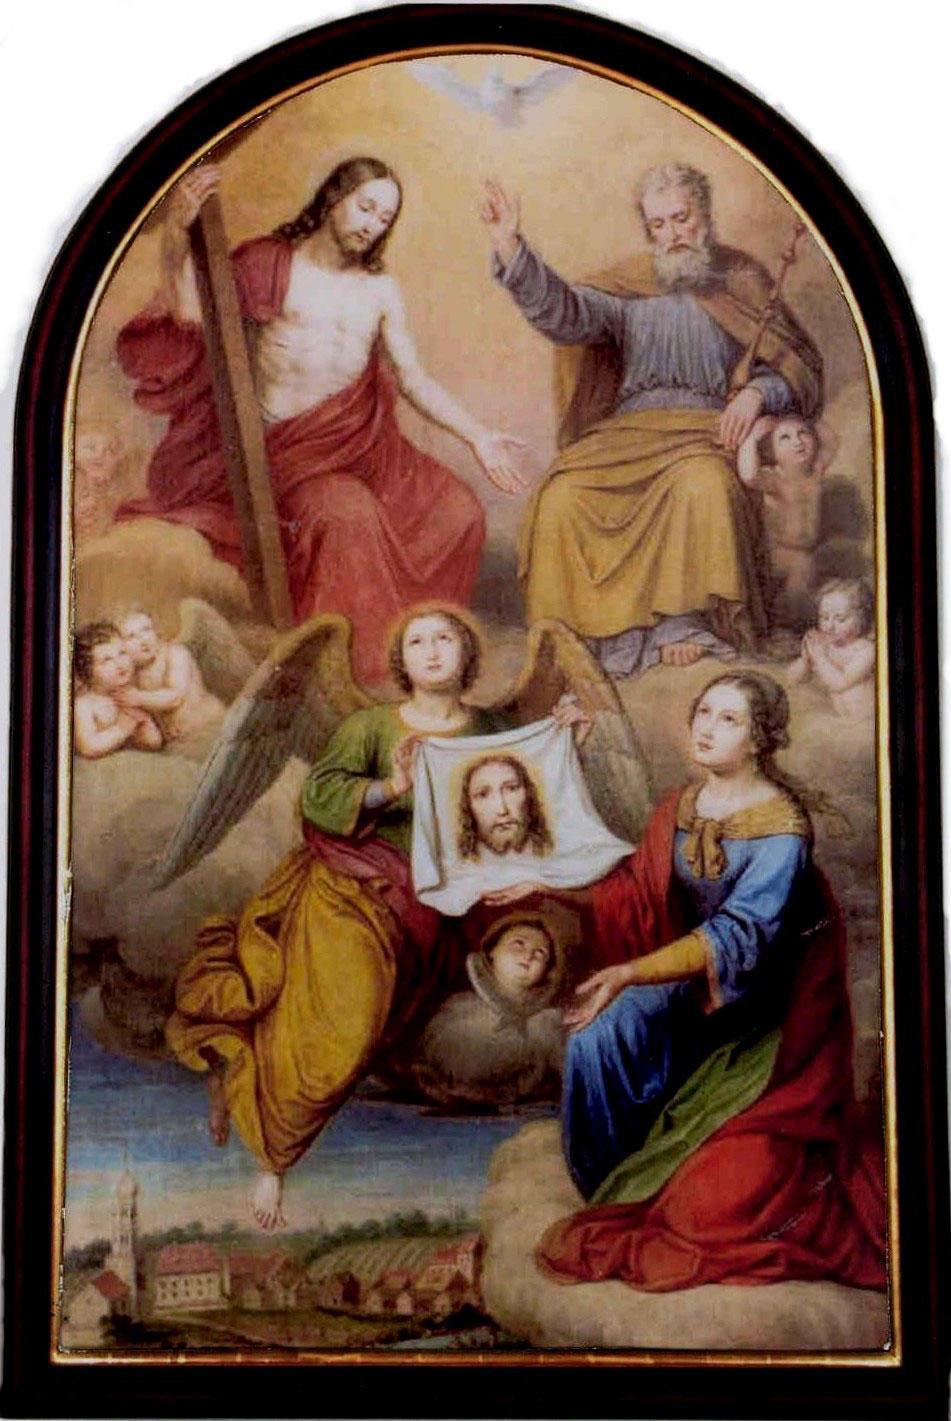 Früheres barockes Altarbild